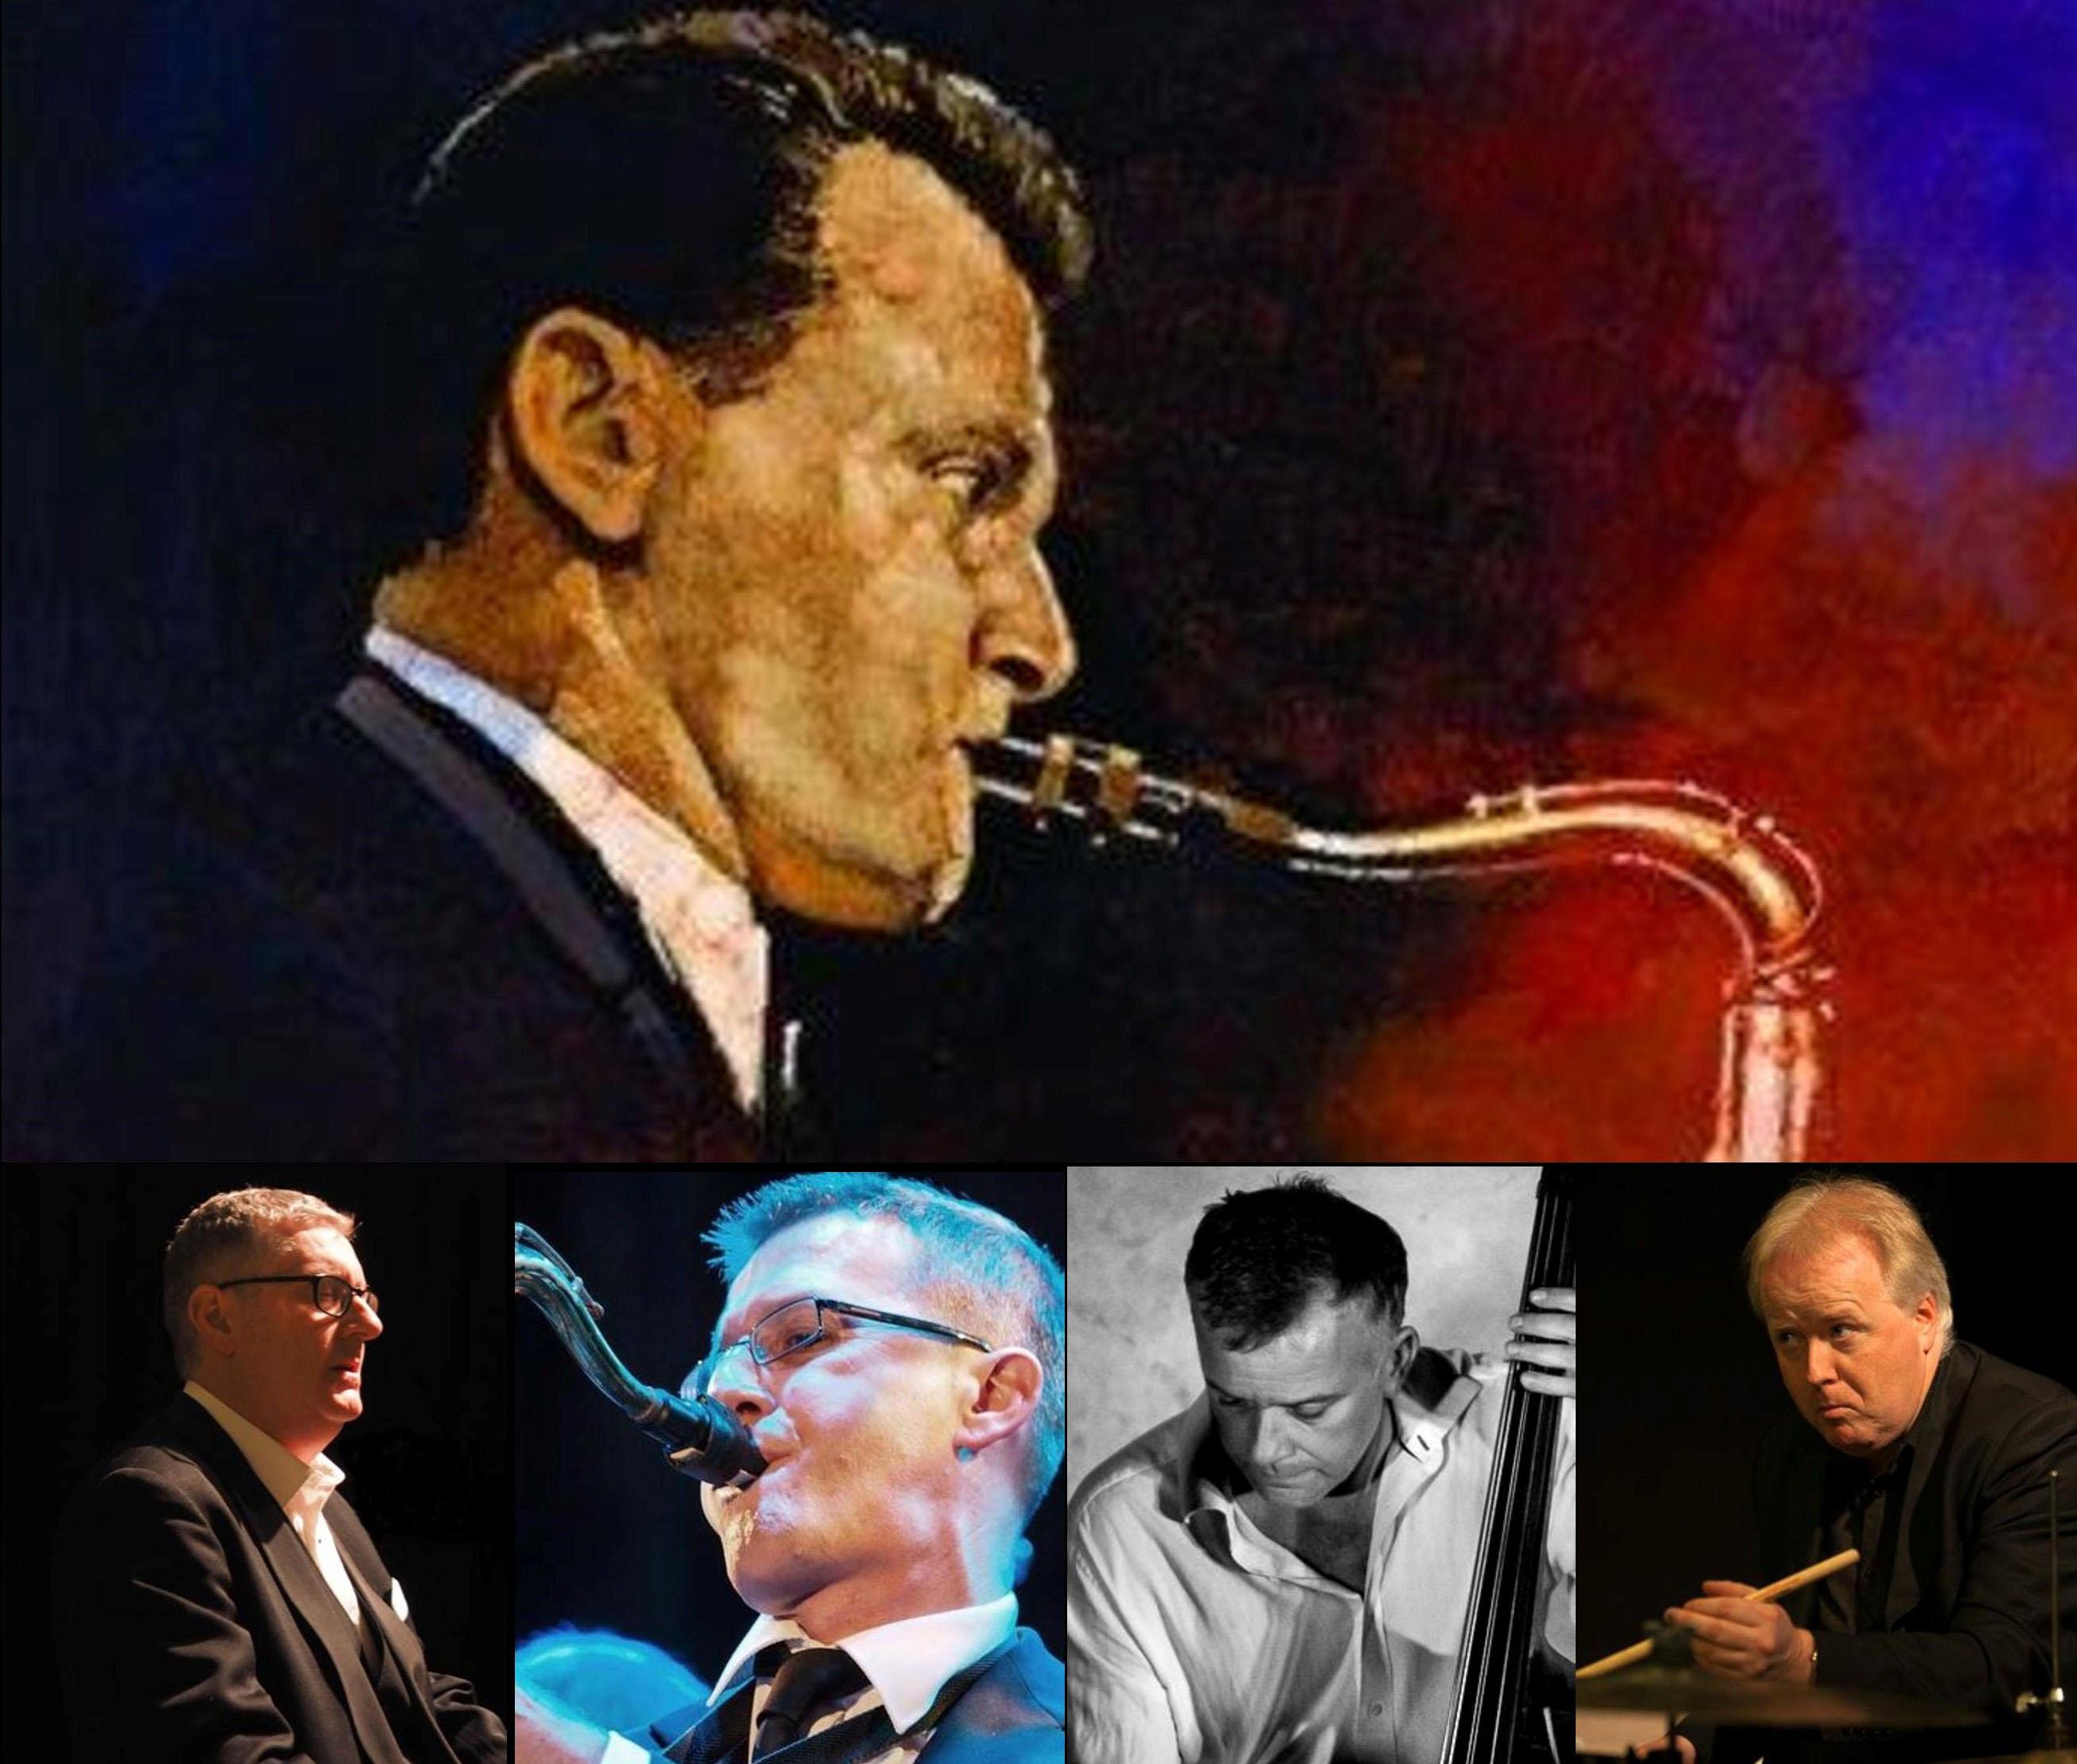 Chris Ingham Quartet featuring Mark Crooks - Getz: A Musical Portrait banner image